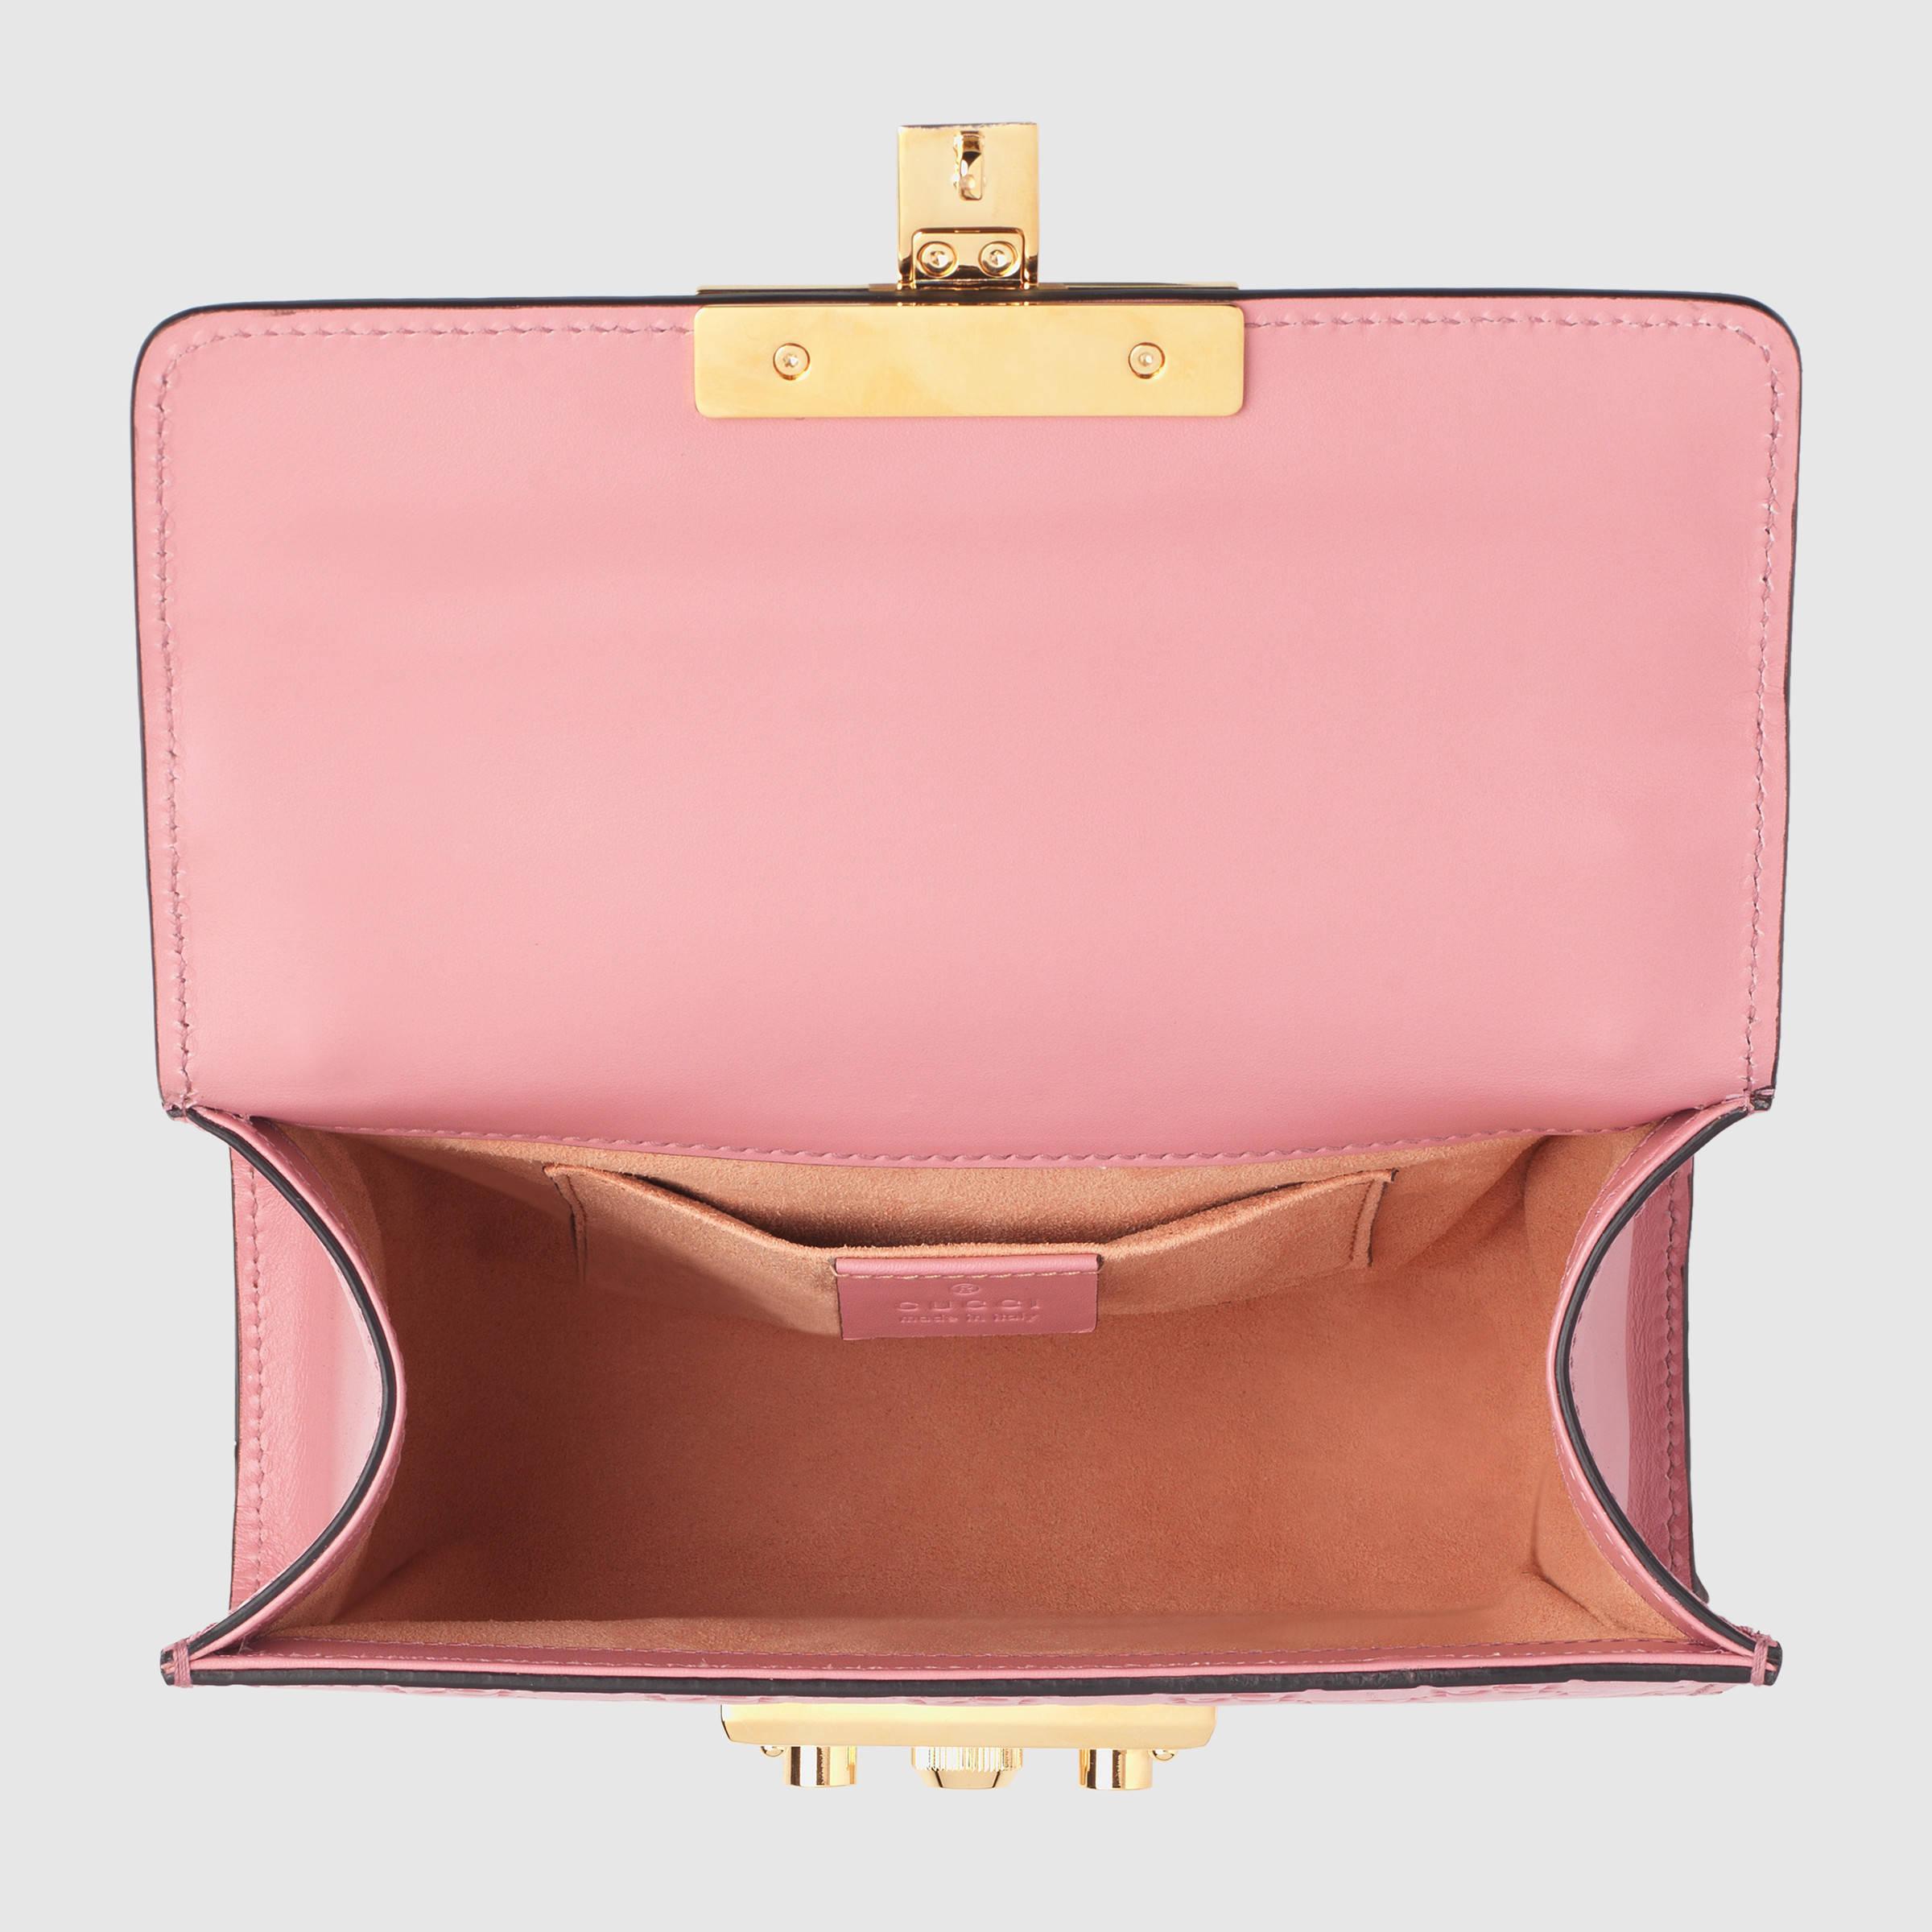 e3bc6b192b1b Lyst - Gucci Padlock Signature Leather Shoulder Bag